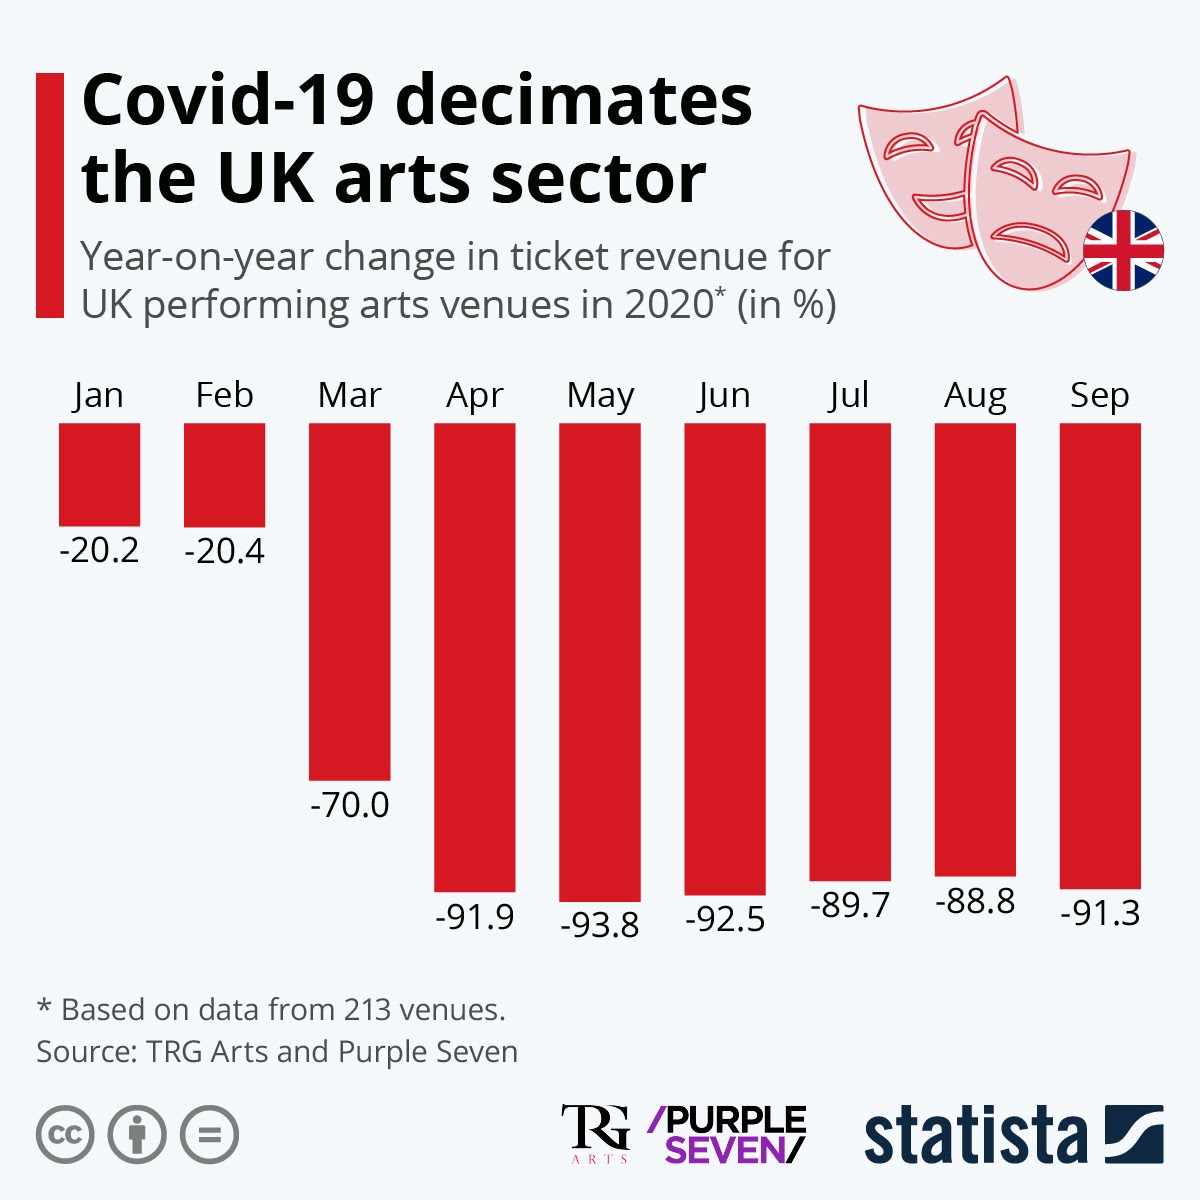 Covid-19 decimates the UK arts sector #infographic